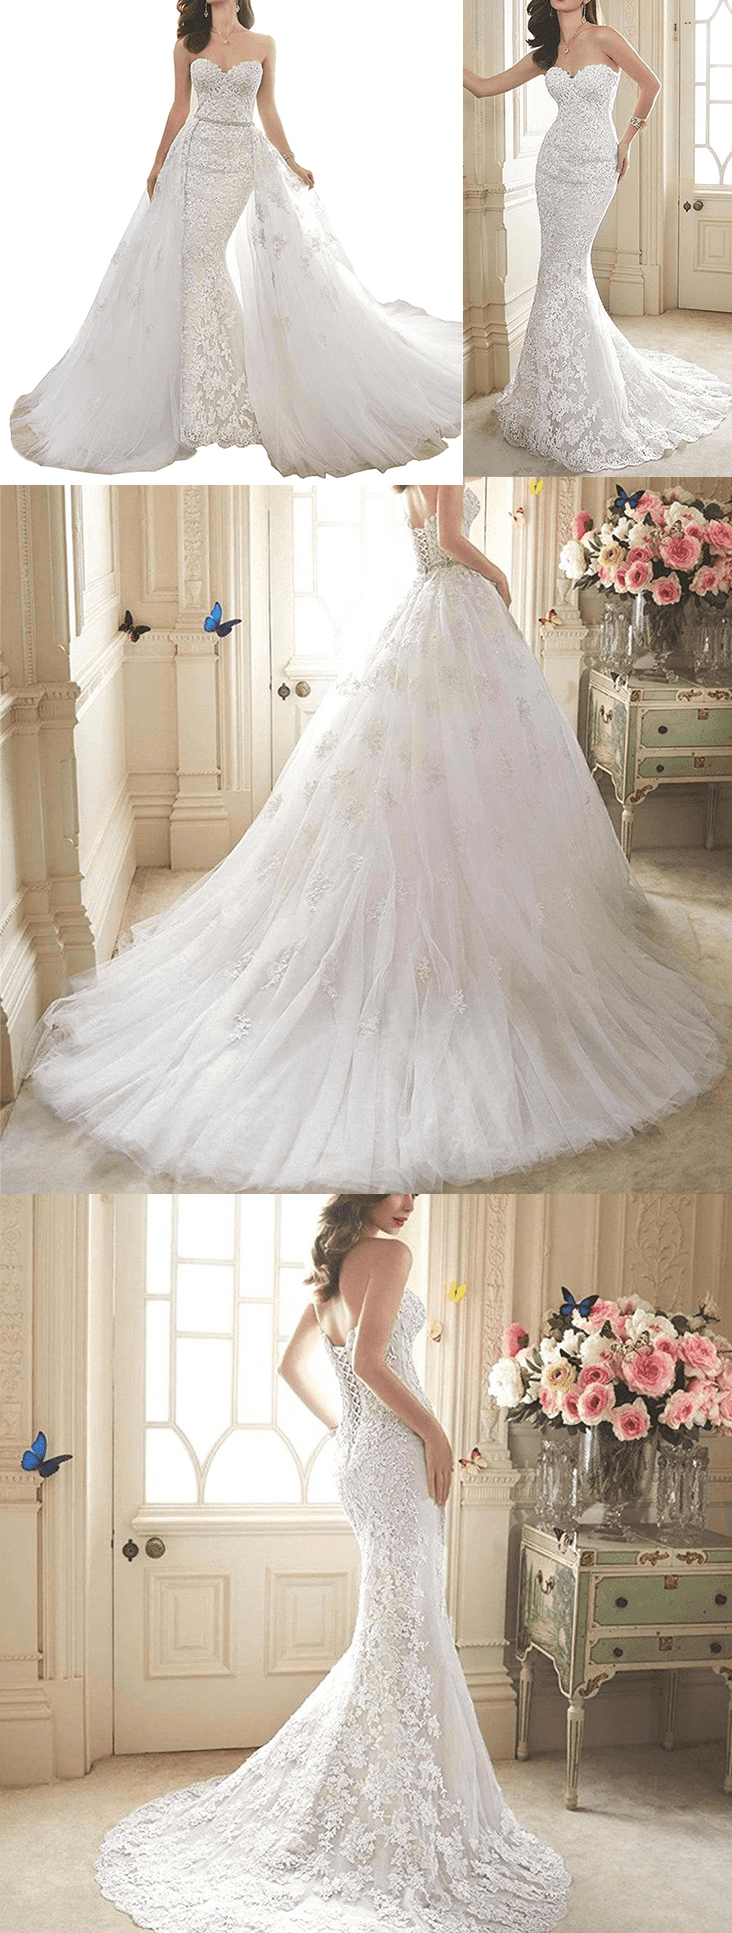 Detachable skirt wedding dress  Tsbridal Detachable Skirt Wedding Dress Lace Mermaid Wedding